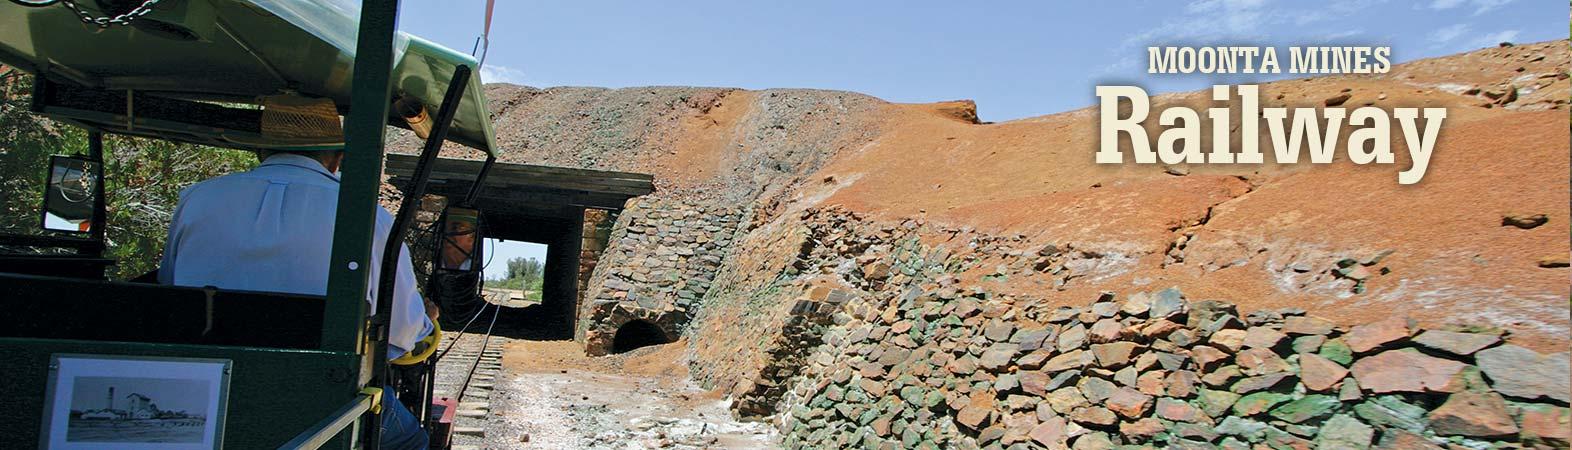 Moonta Mines Railway